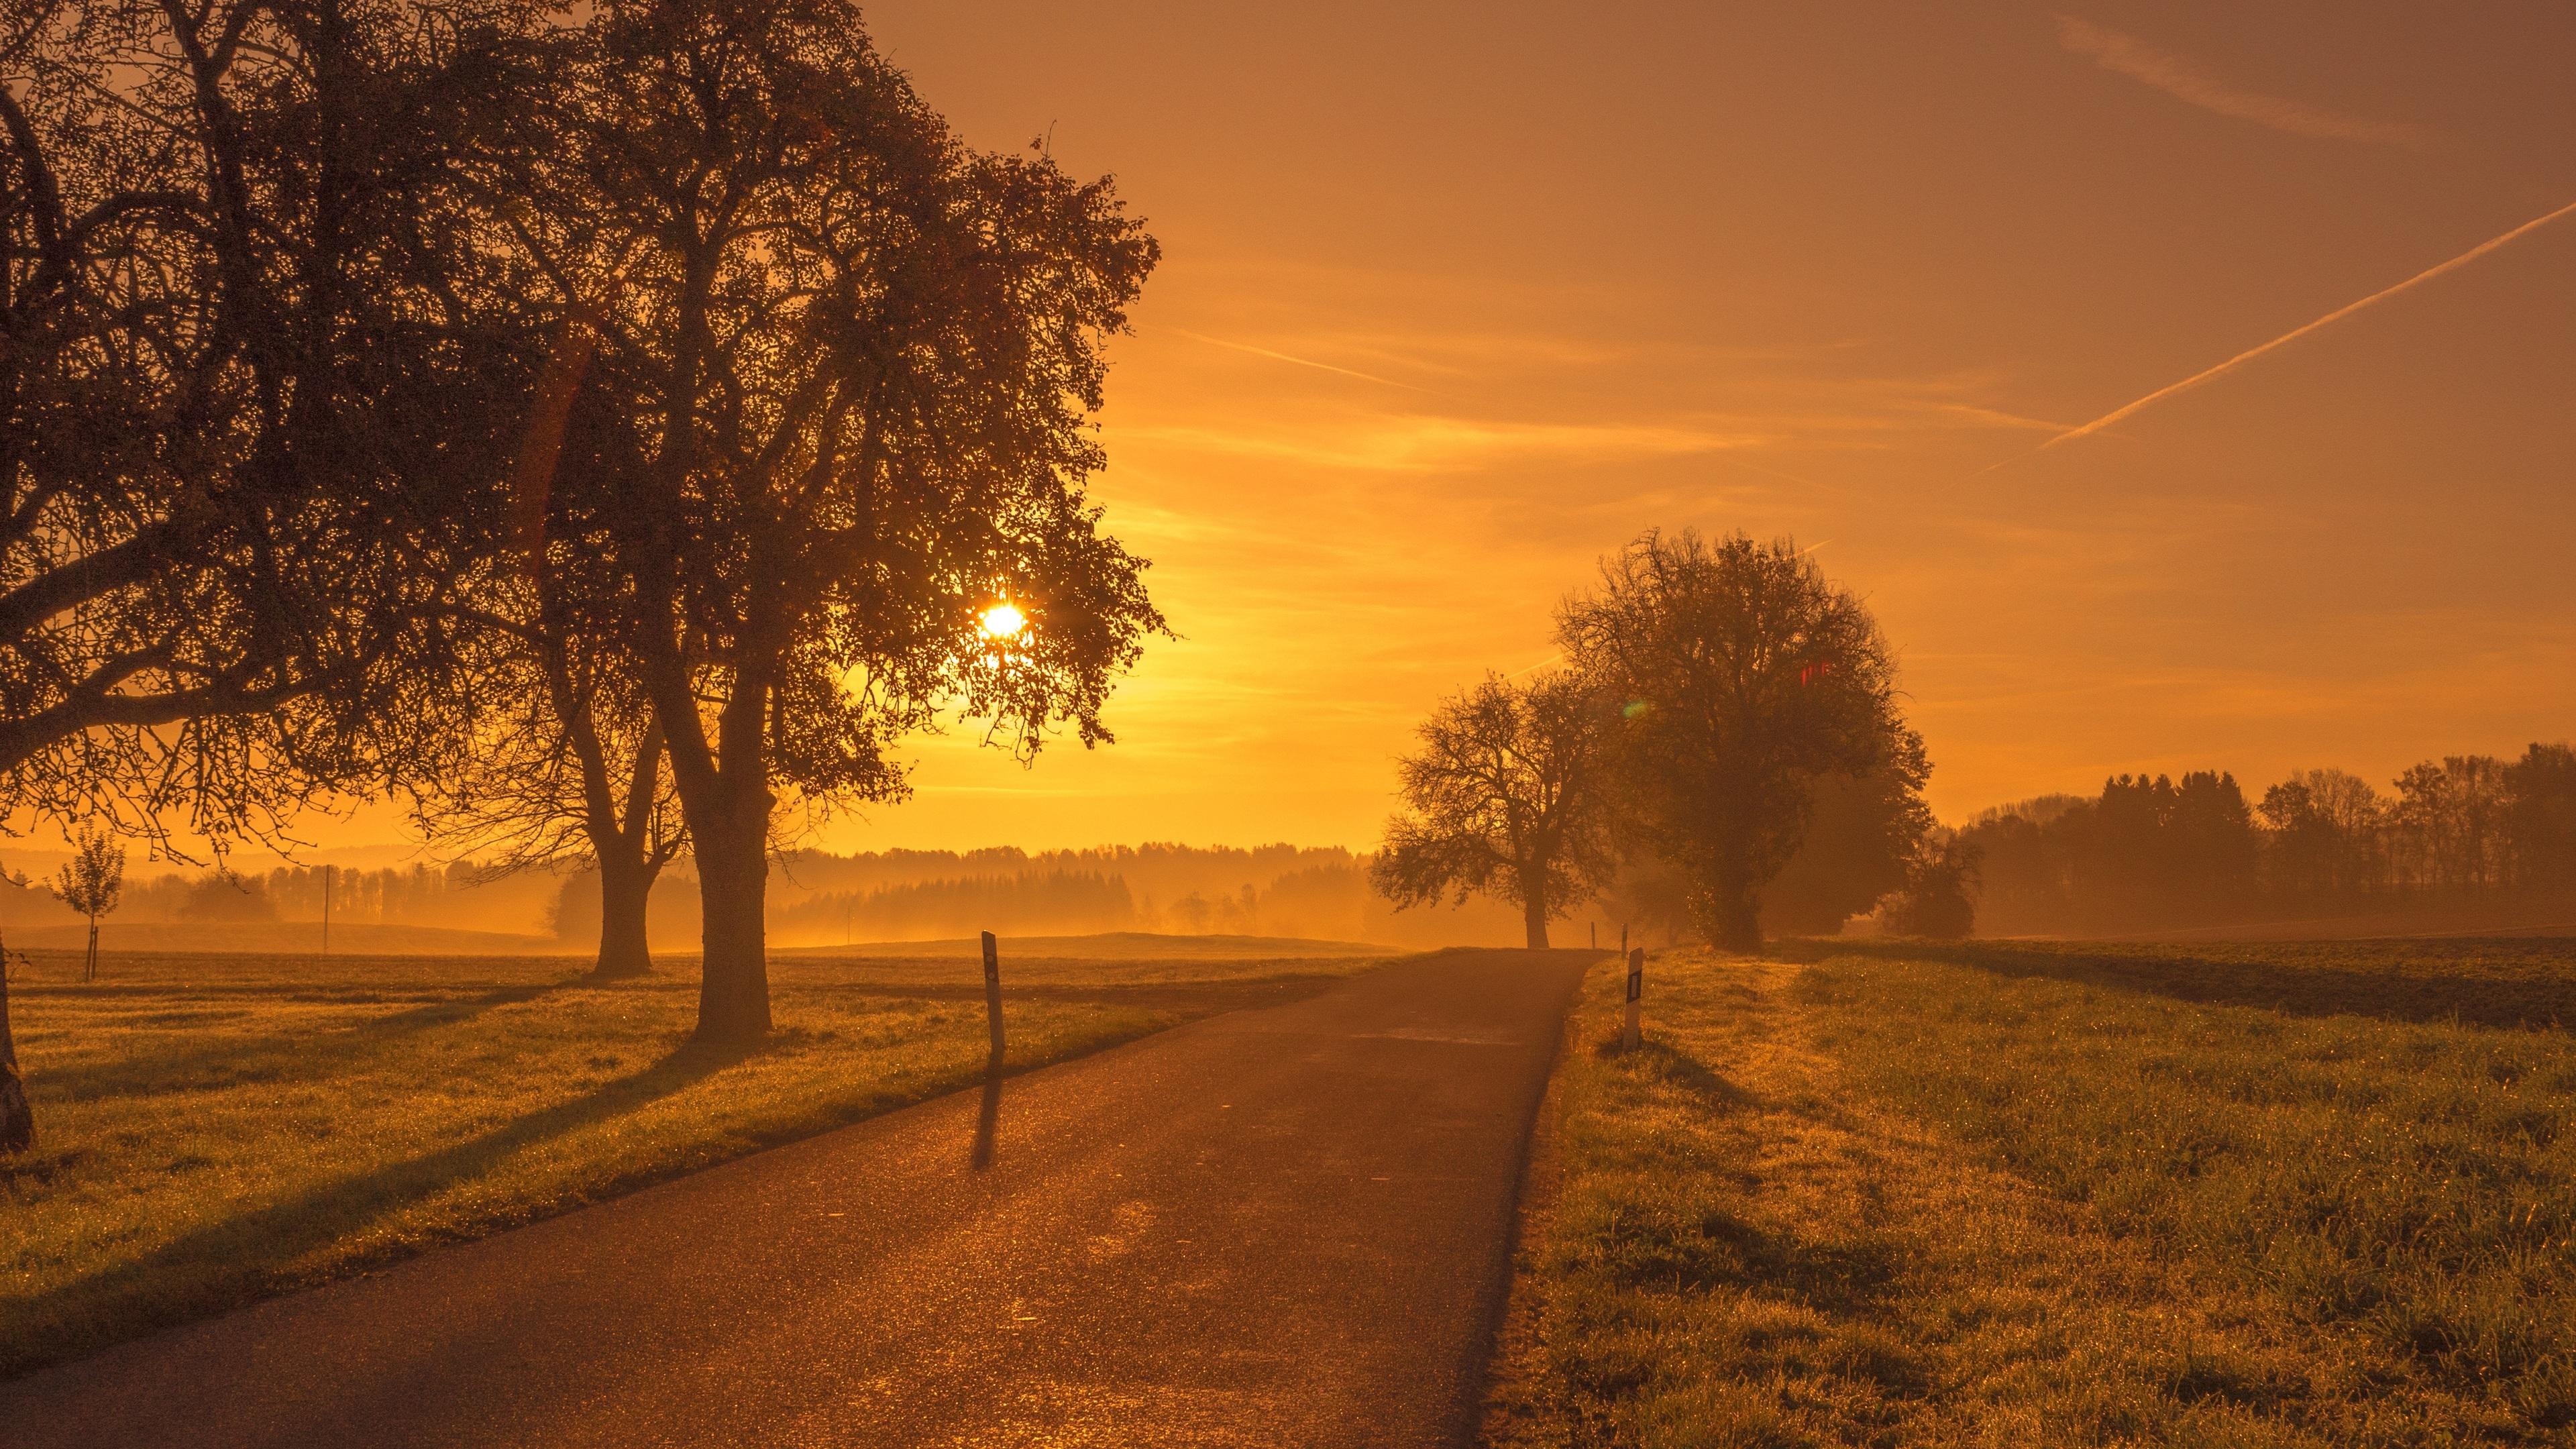 scenic road sunrise sunset trees meadow 1551644501 - Scenic Road Sunrise Sunset Trees Meadow - trees wallpapers, sunset wallpapers, sunrise wallpapers, nature wallpapers, hd-wallpapers, 4k-wallpapers